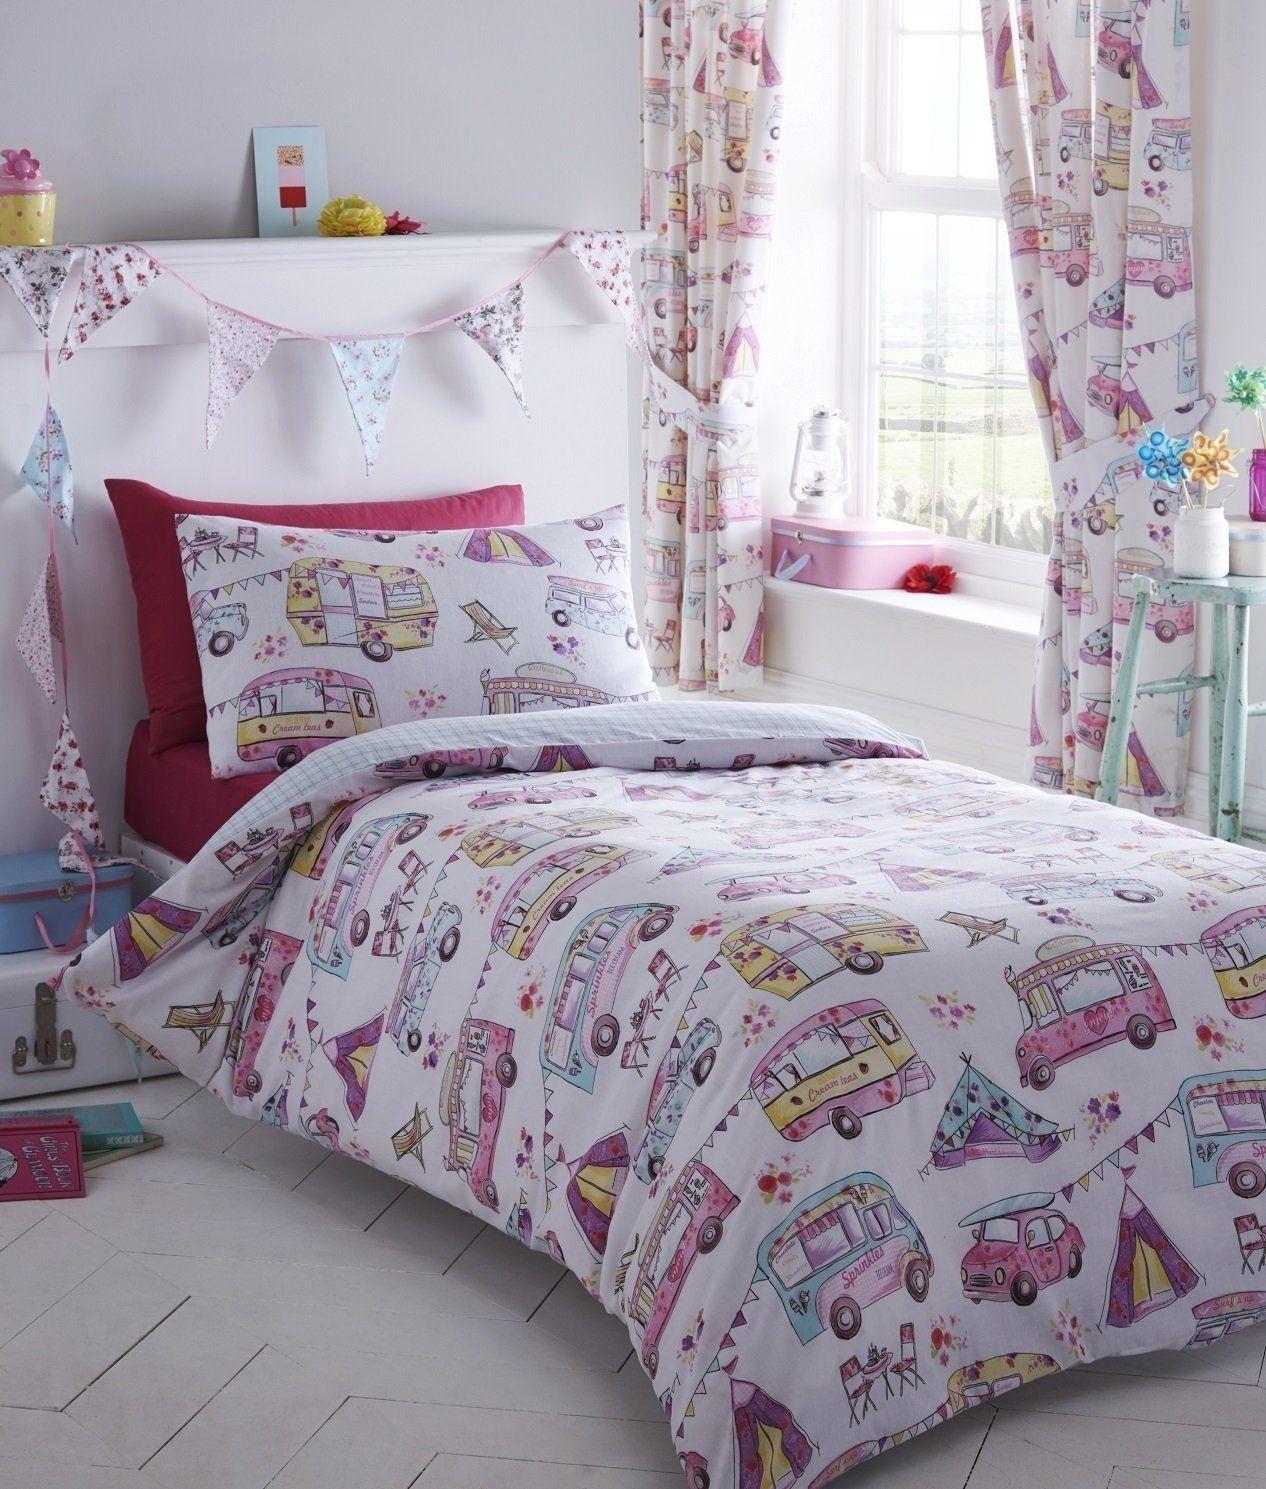 King Size Glamping Camping Caravan Design Reversible Duvet Cover & Matching Pillowcases